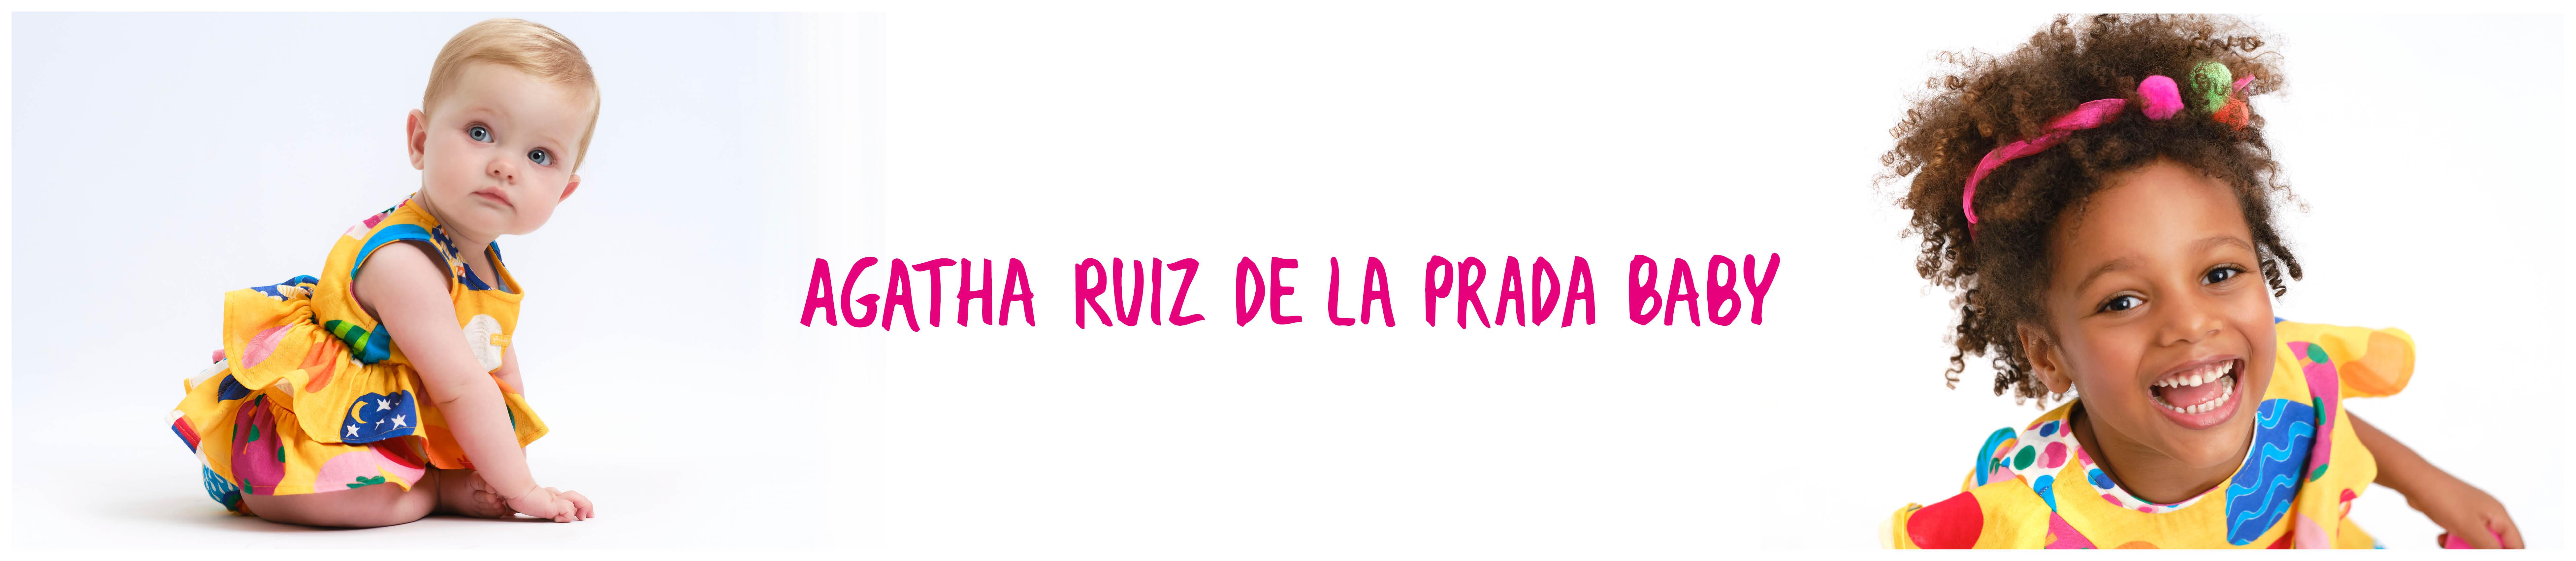 Agatha-Ruiz-banner